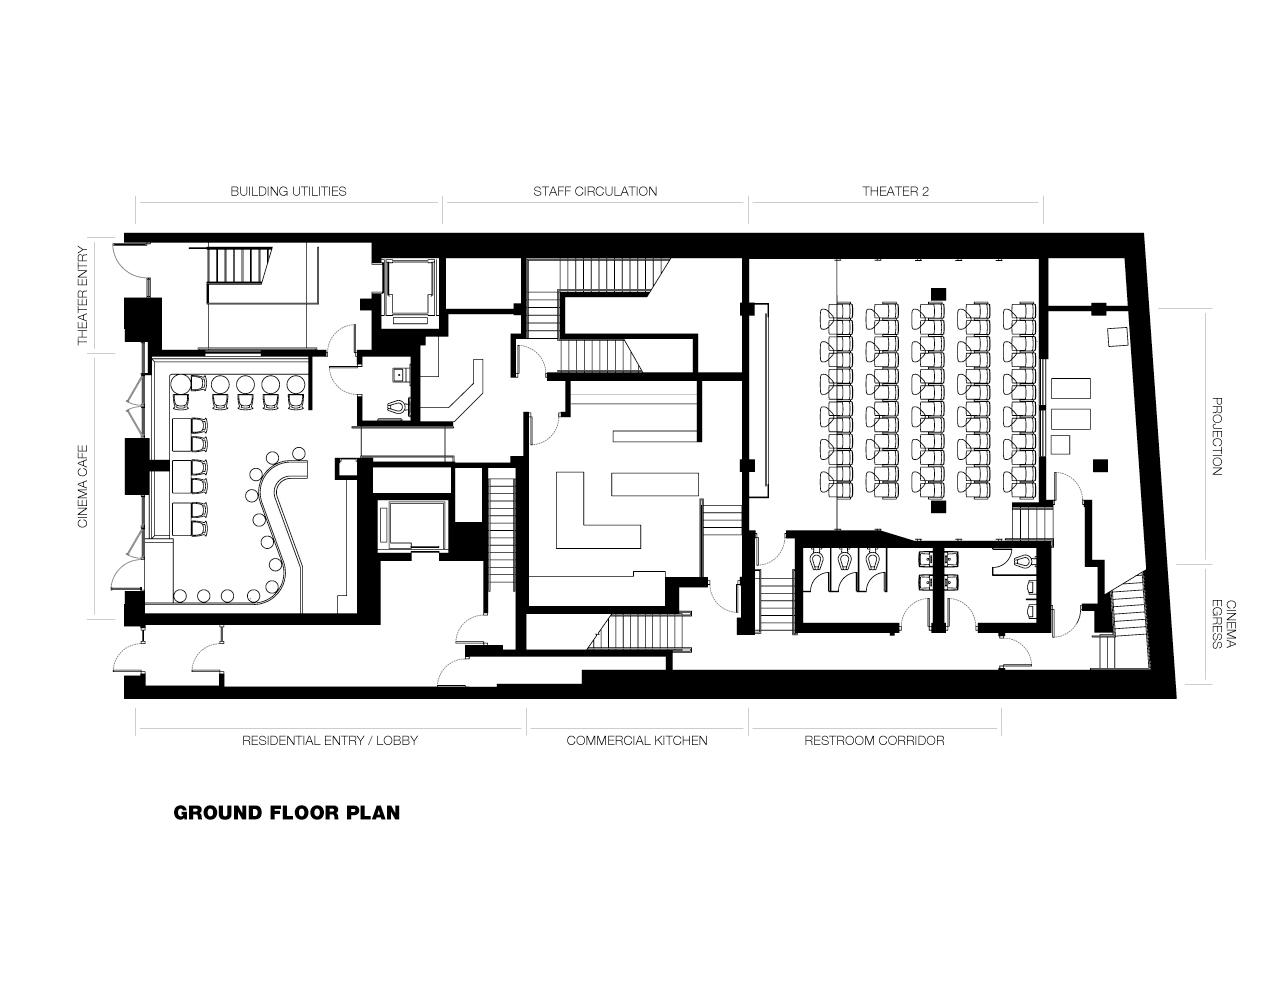 gallery of nitehawk cinema and apartments caliper studio 3 nitehawk cinema and apartments caliper studio ground floor plan